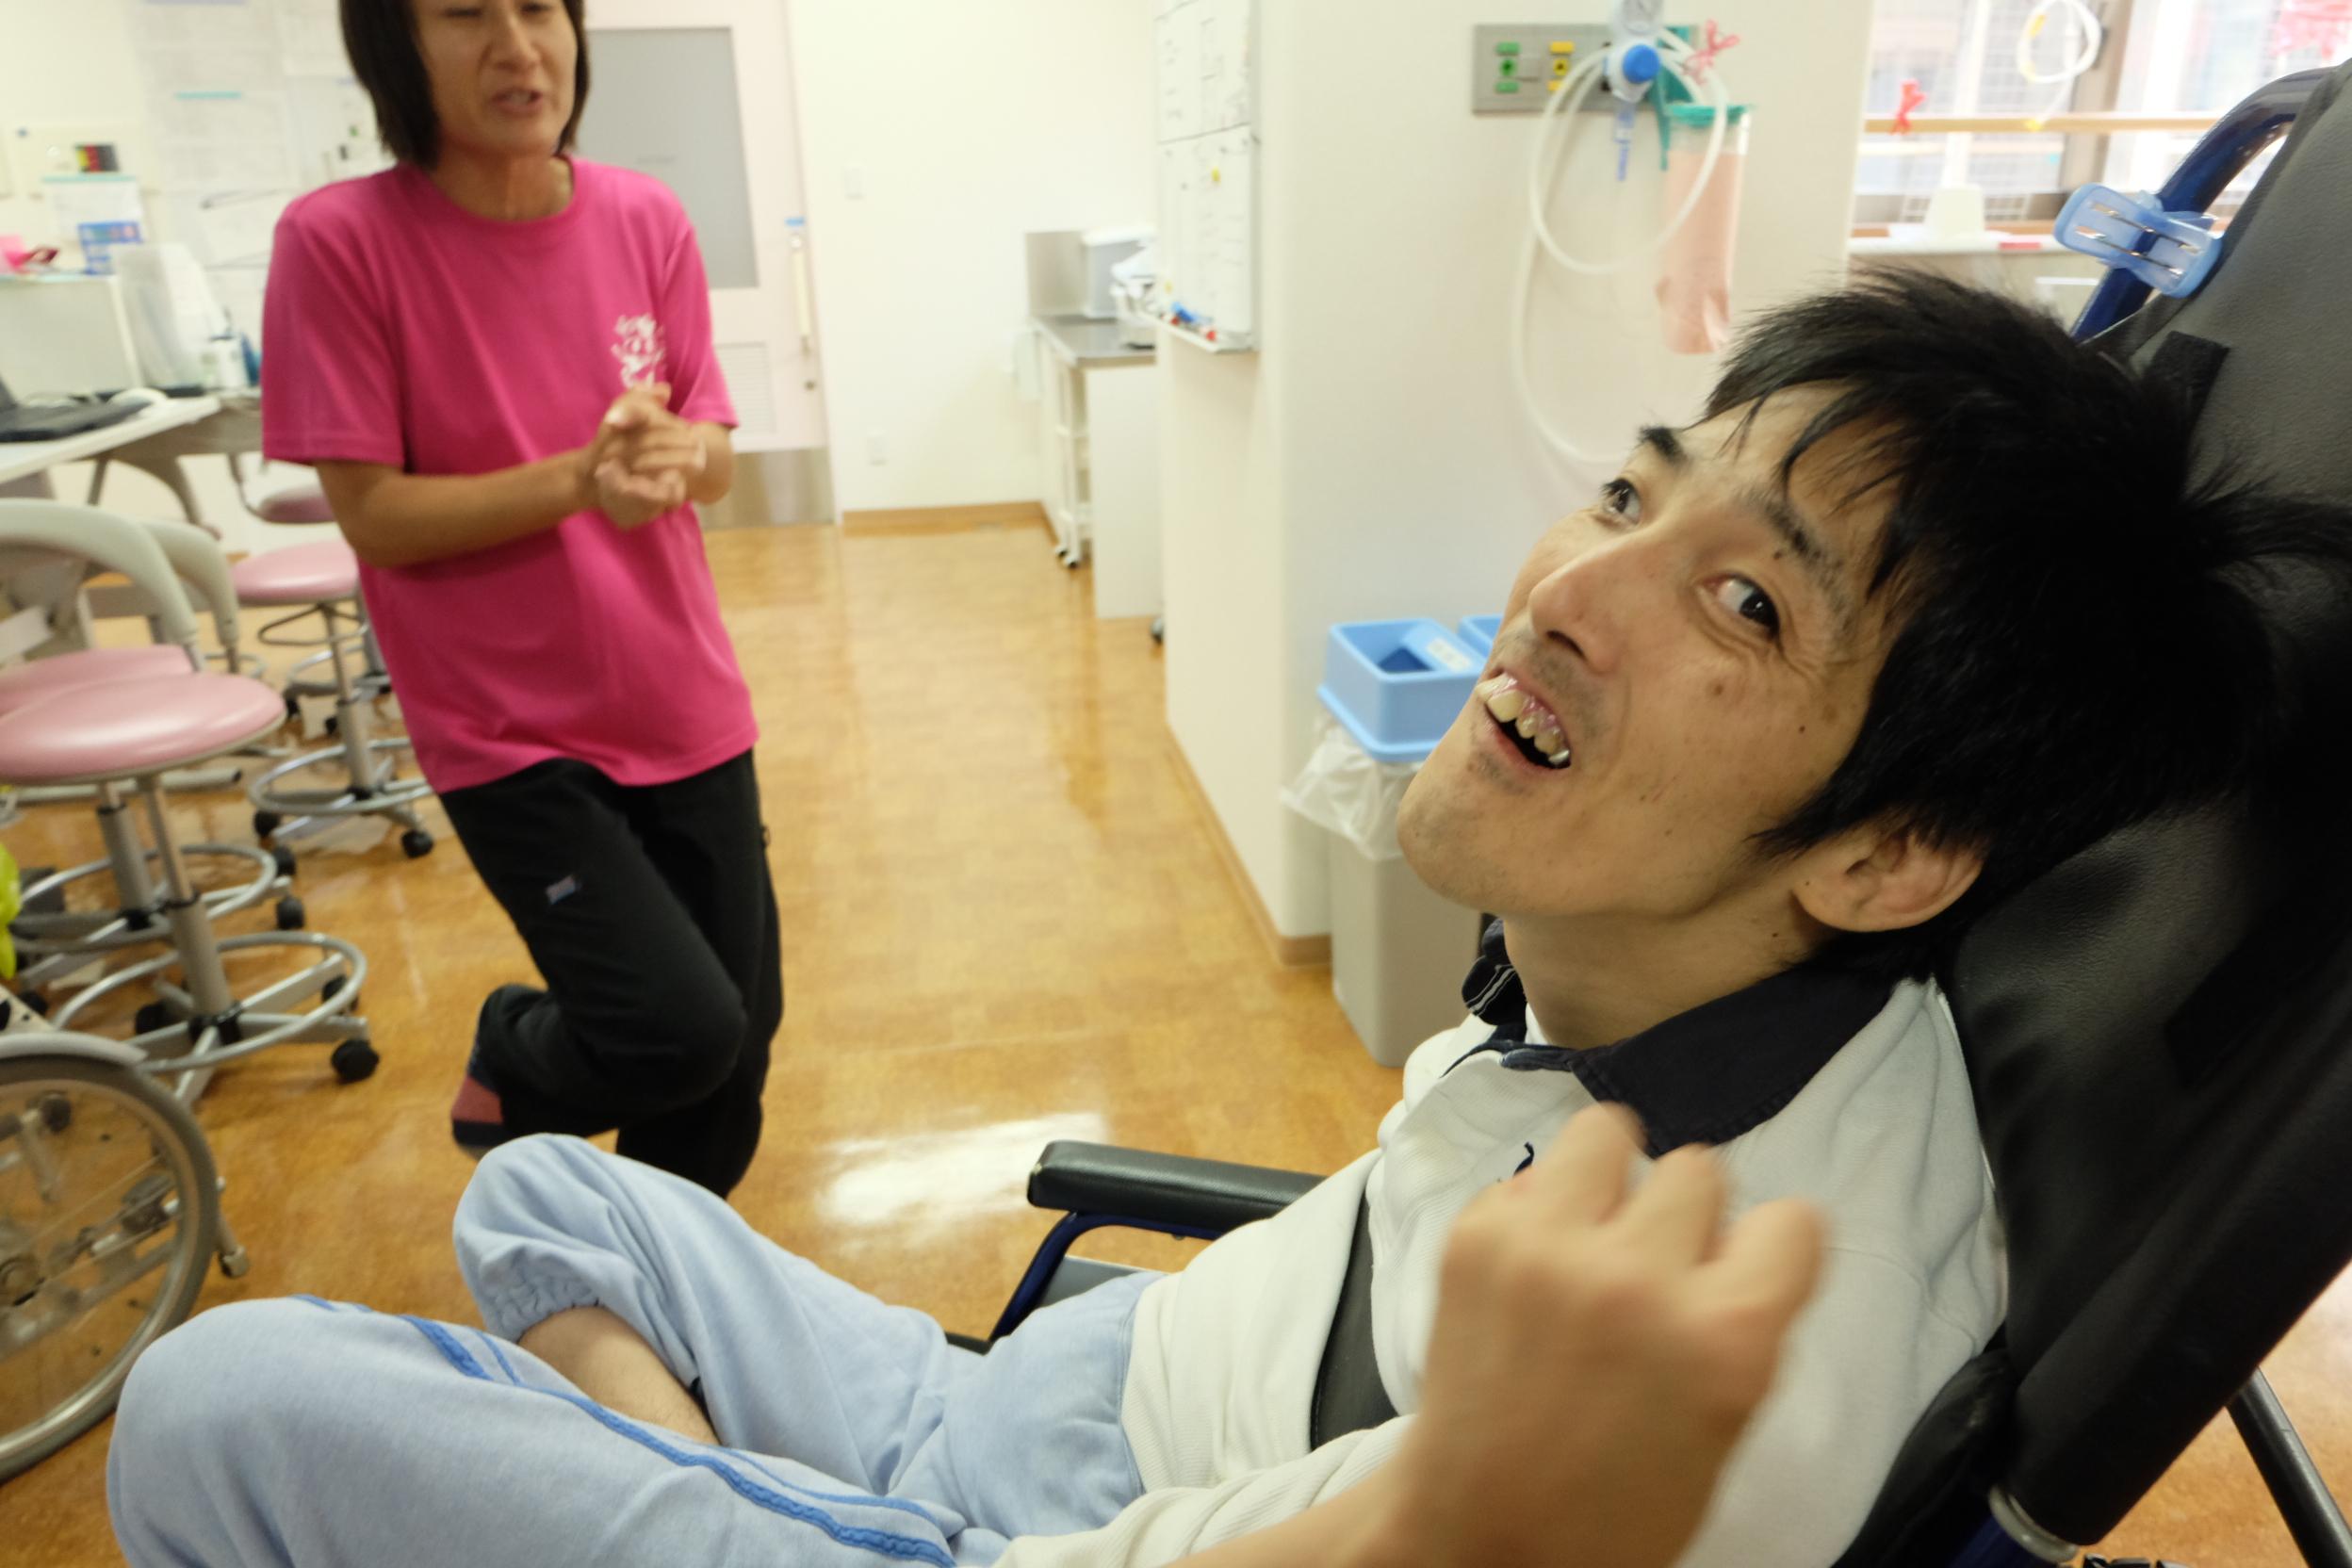 http://minato-yuu.or.jp/member/DSCF6742.JPG